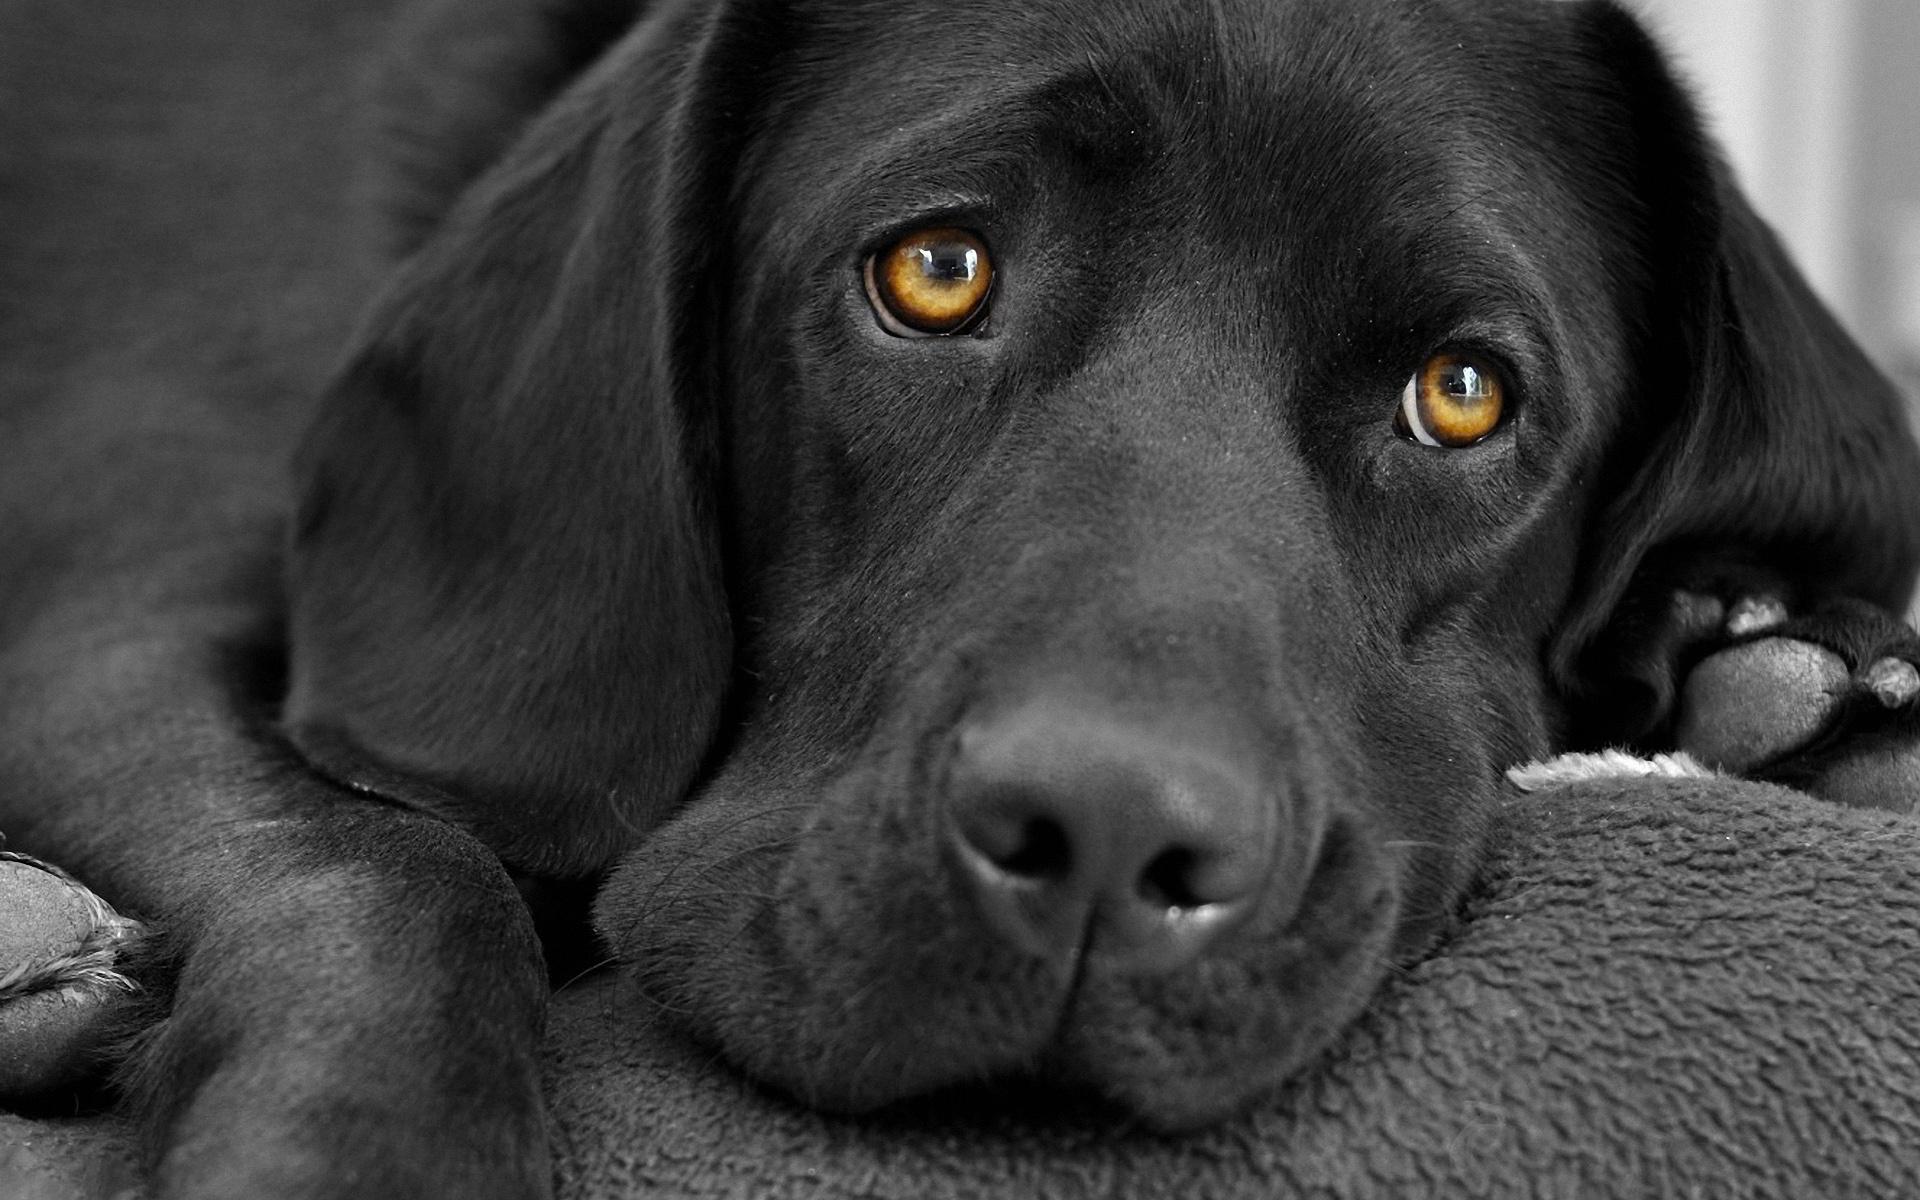 Black Dog Wallpaper Hd Desktop Wallpapers 4k Hd